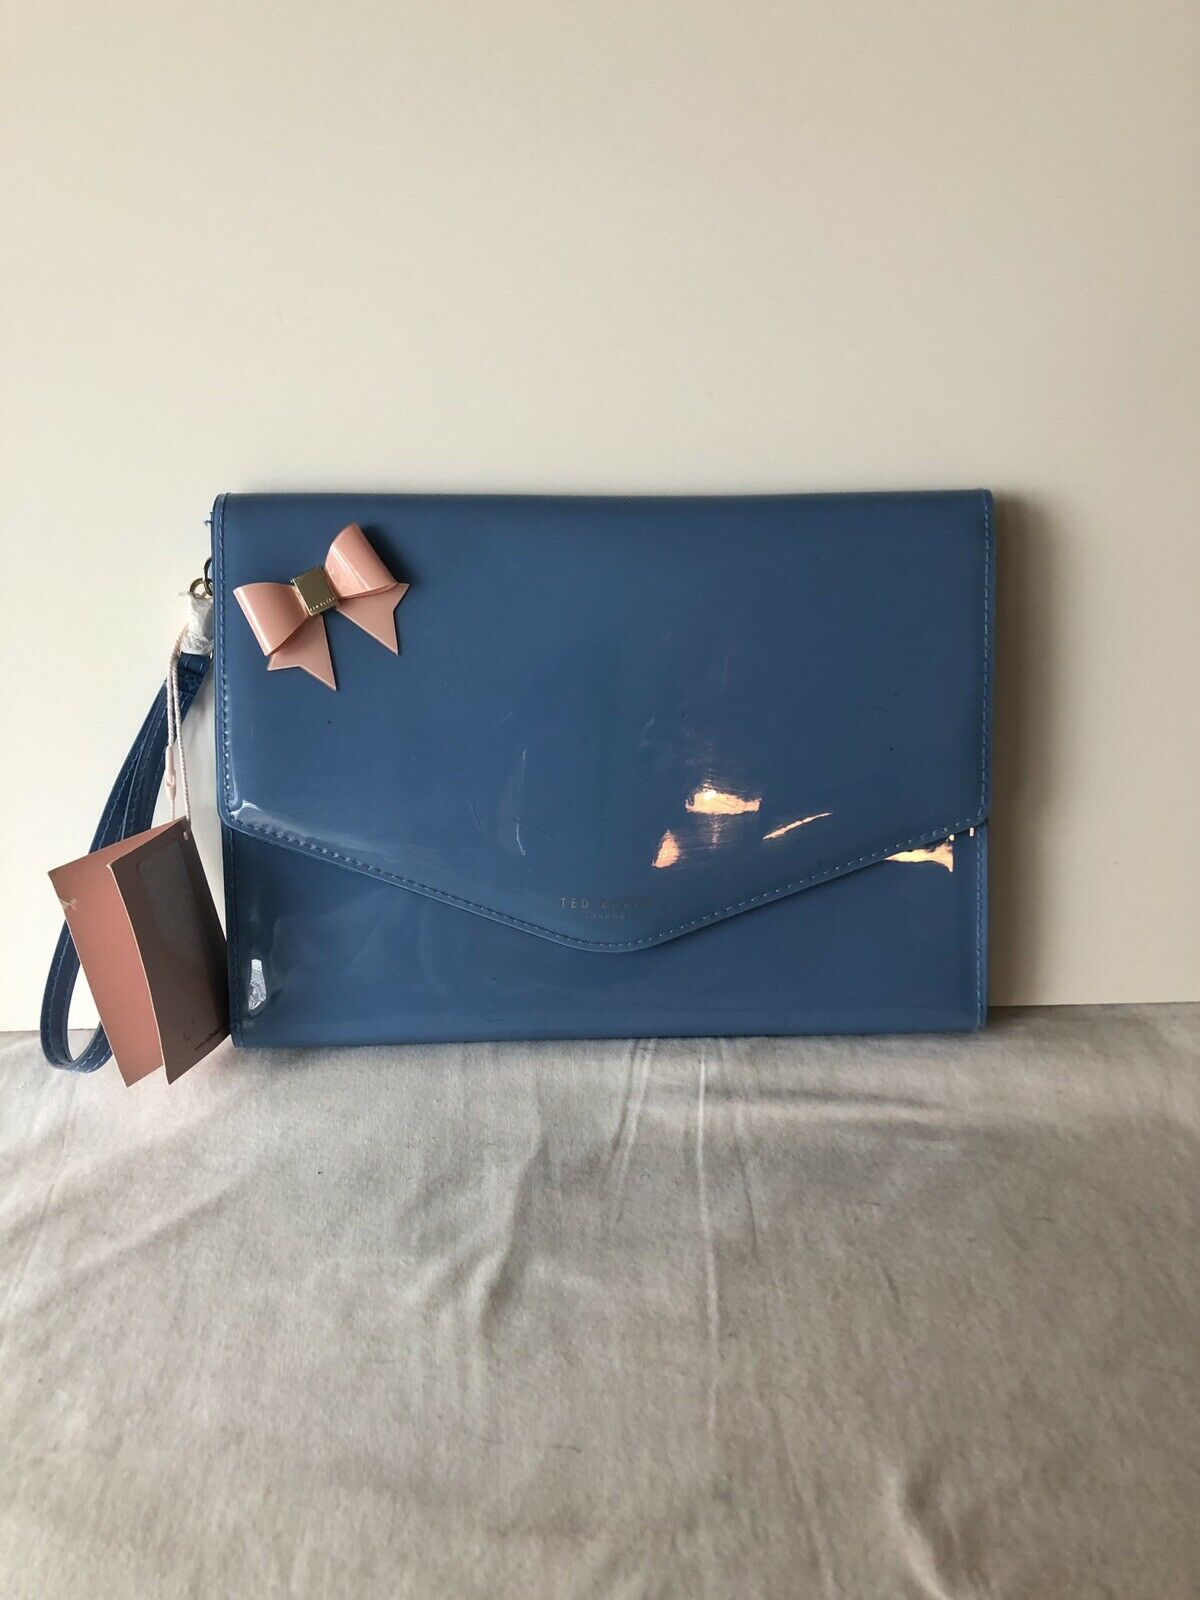 Ted Baker London - Bow Envelope Pouch Clutch Wristlet Blue